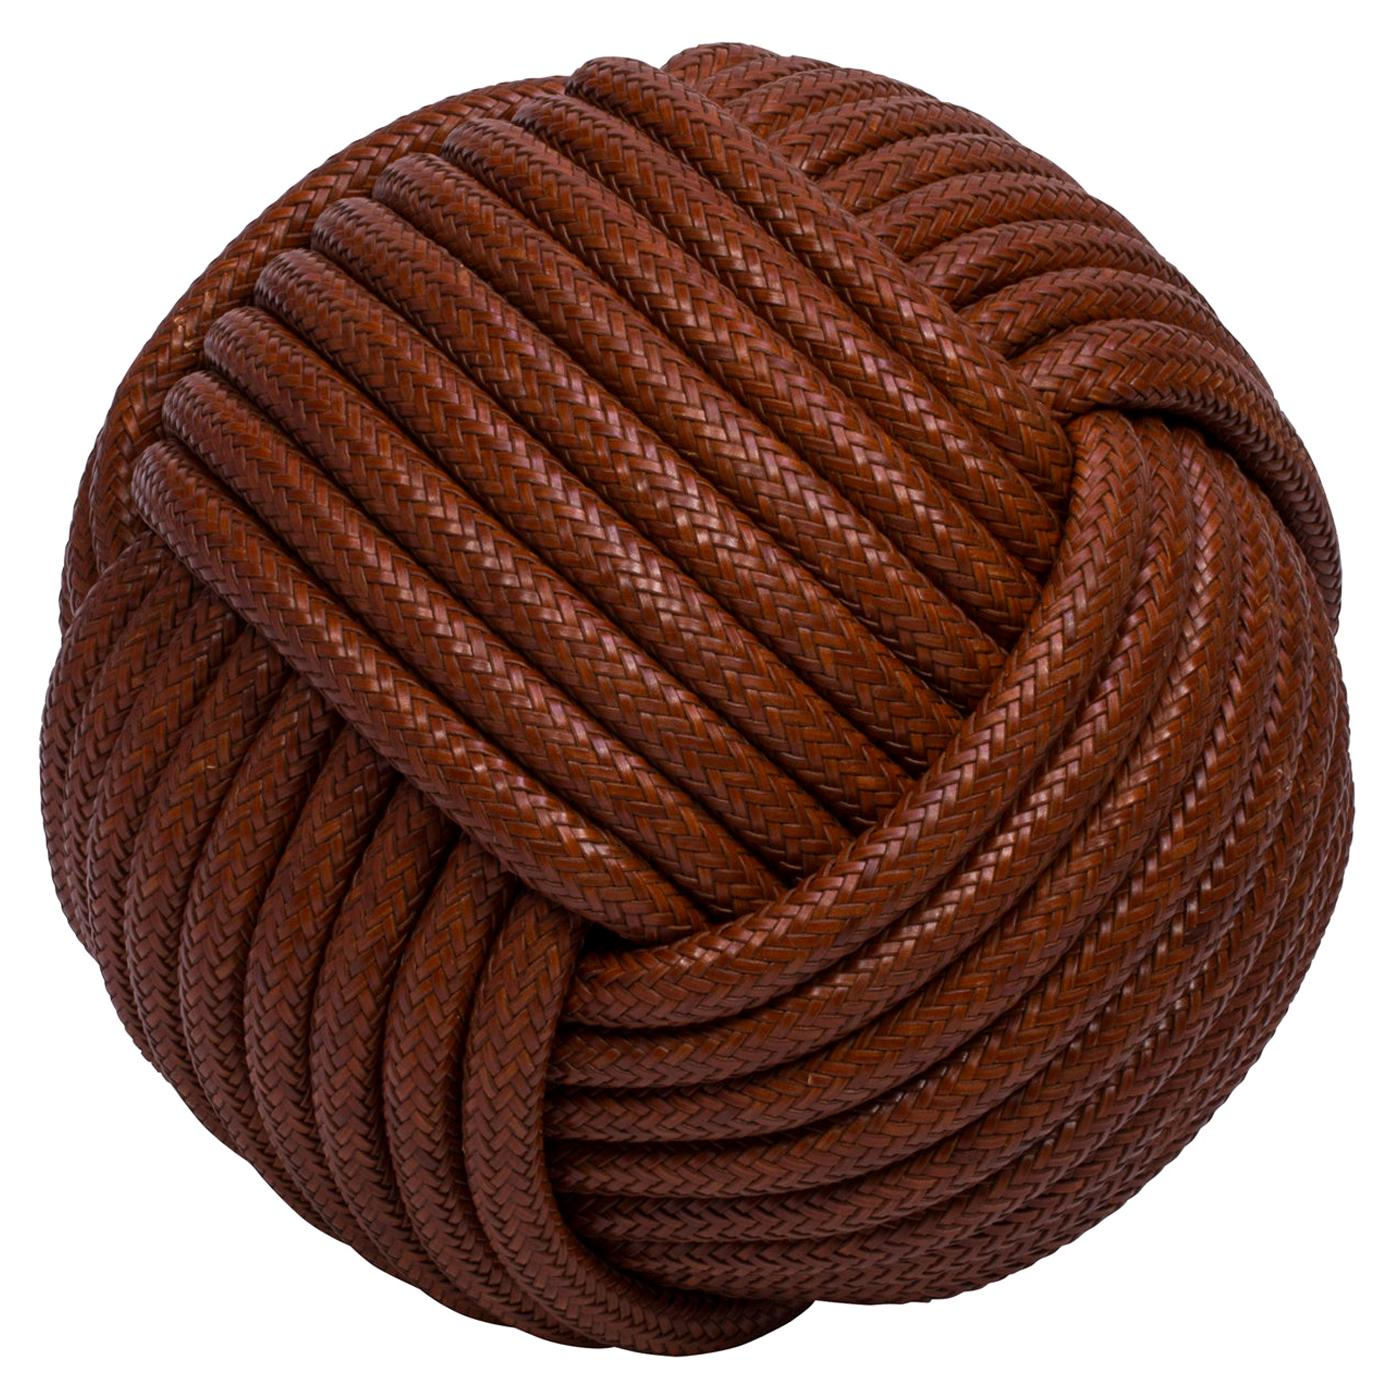 Nodo Leather Pouf